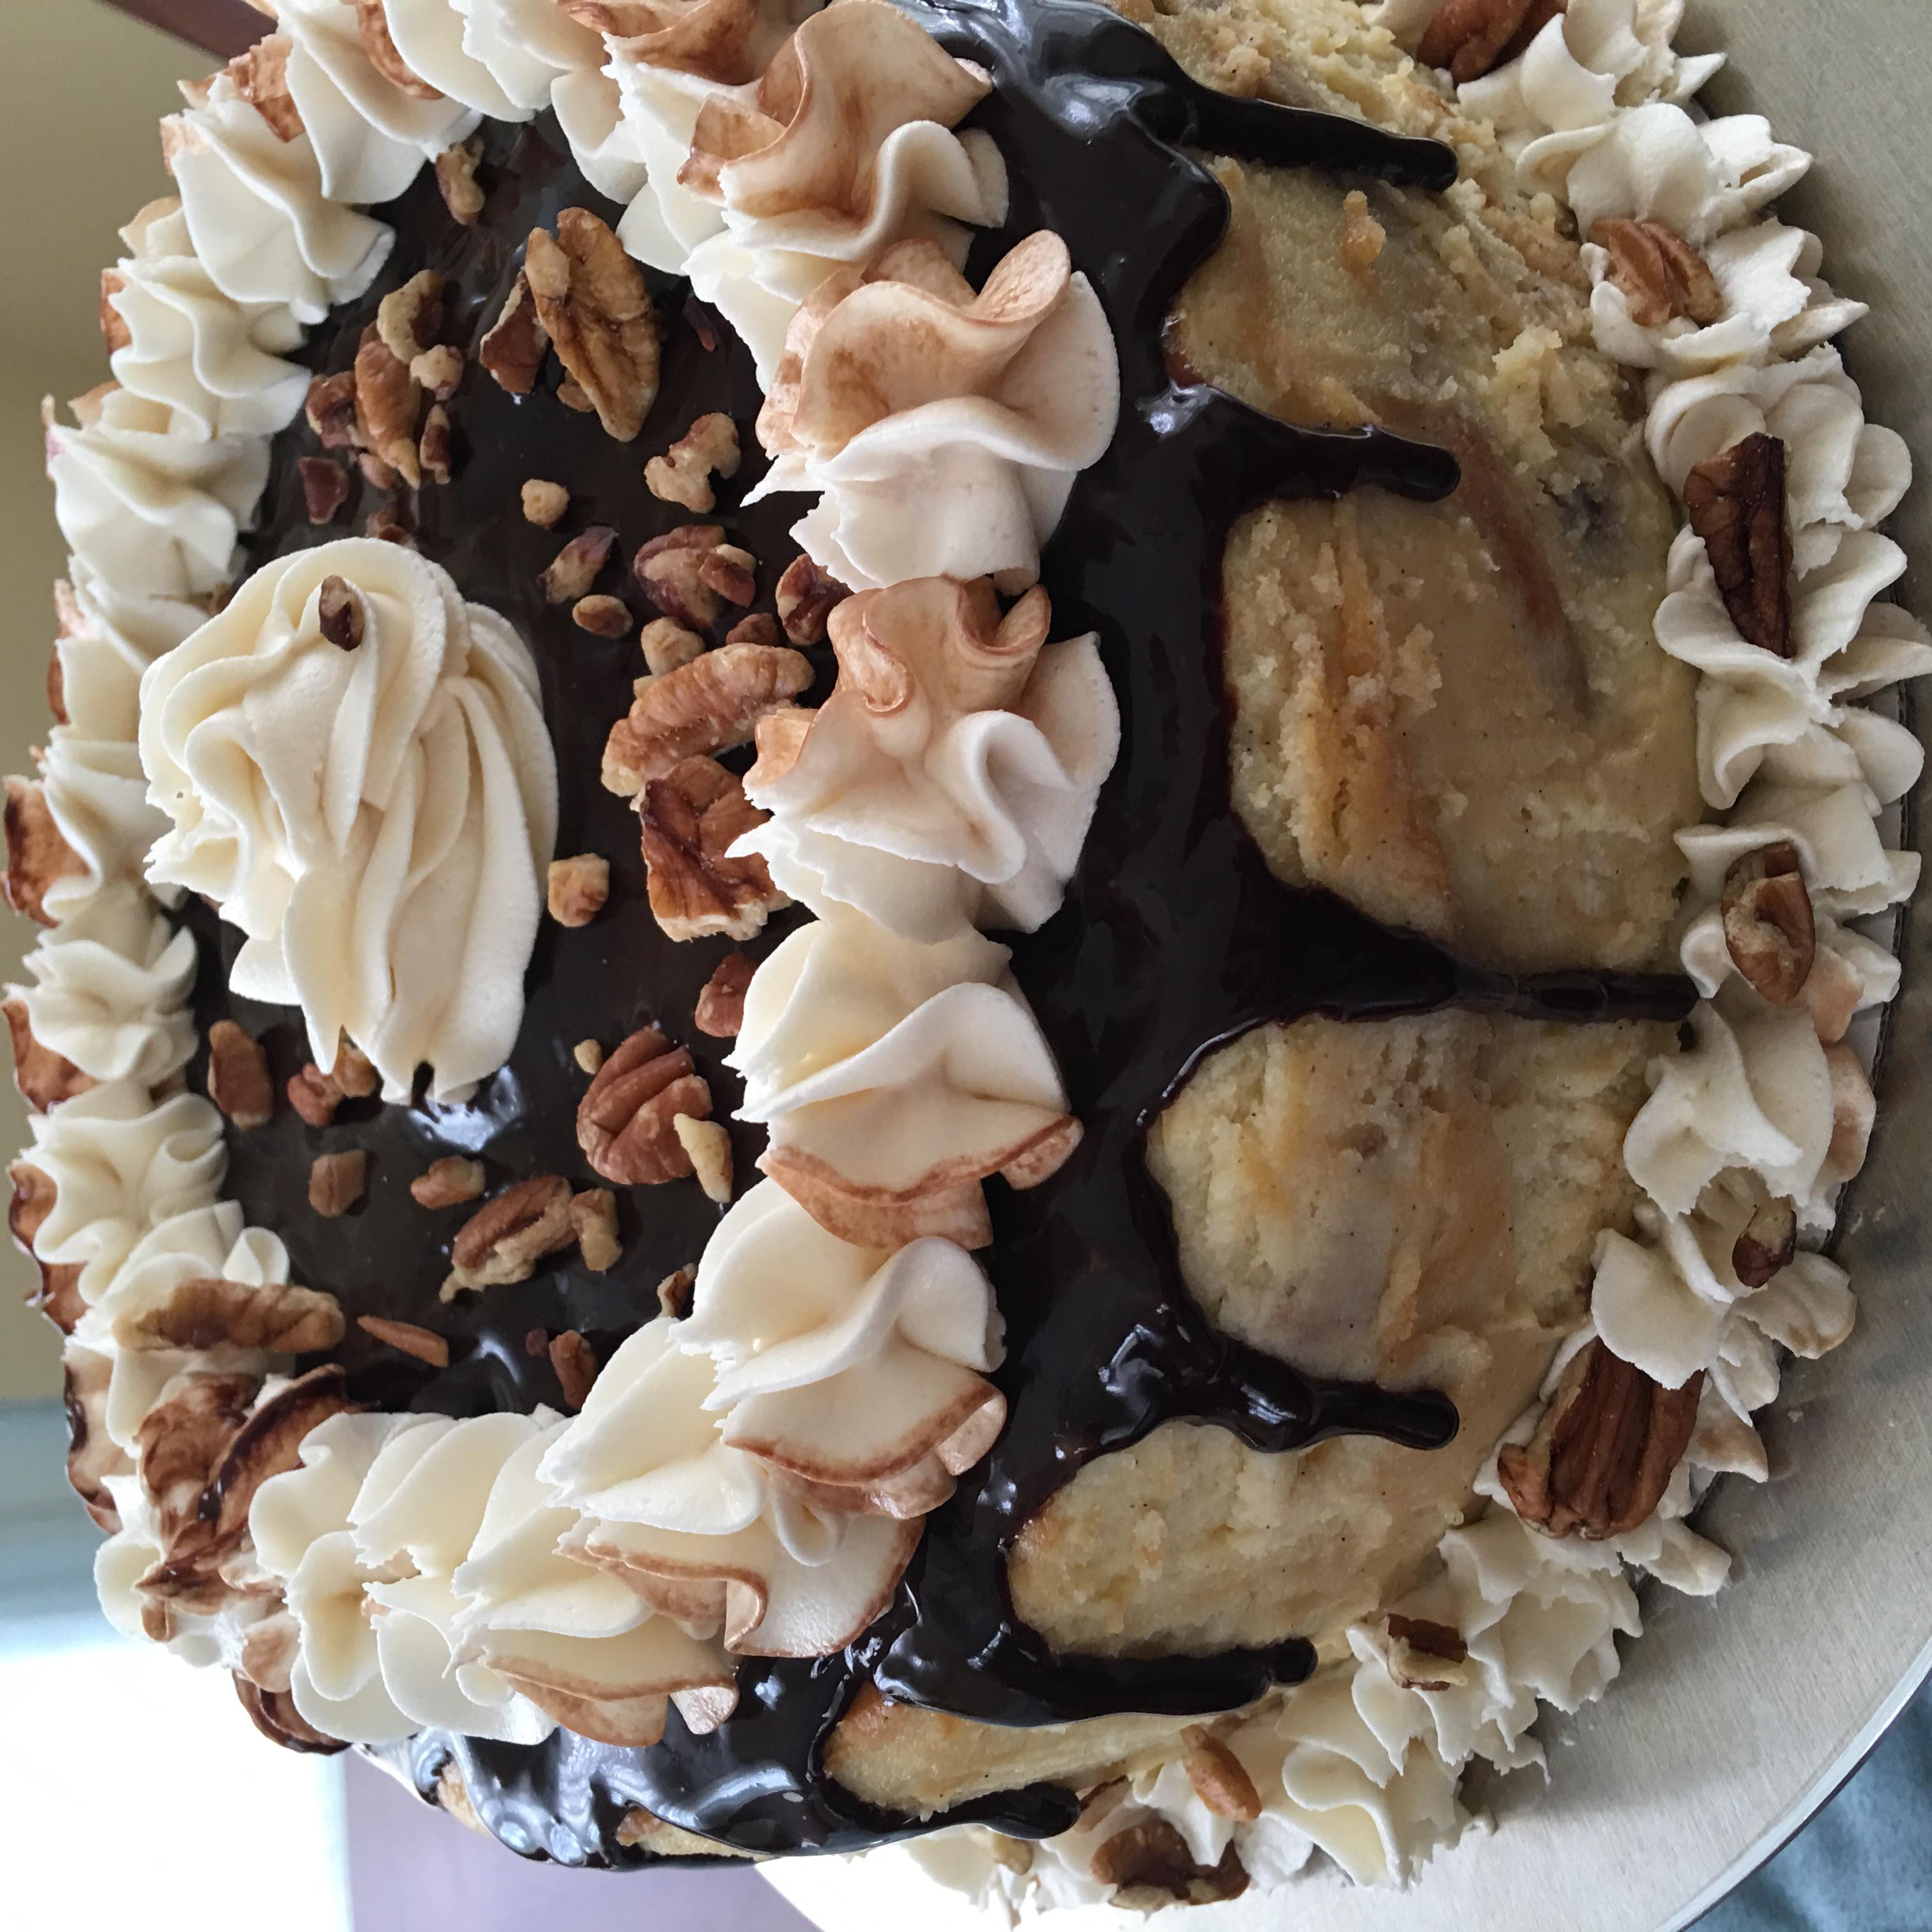 Cheesecake Cakes Image